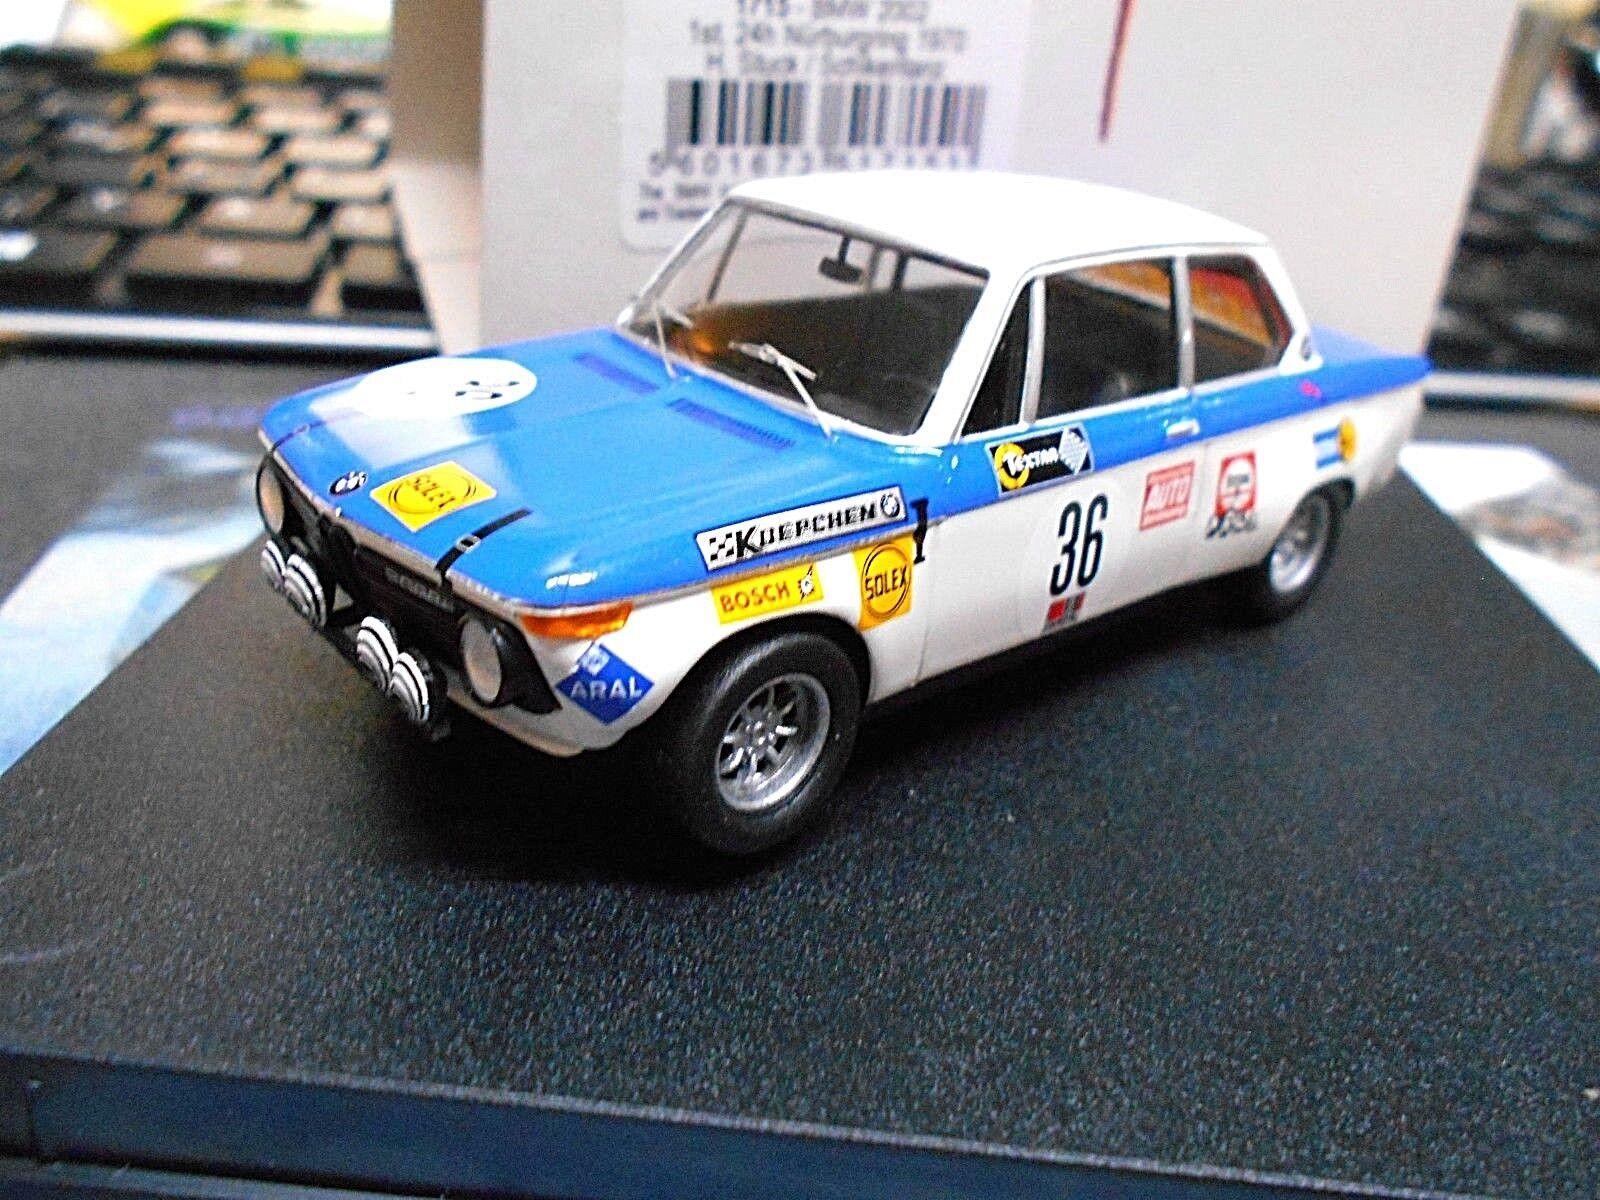 BMW 2002 24 H NURBURGRING WINNER 1970  36 stucco mandare danza 1715 Trofeu 1:43